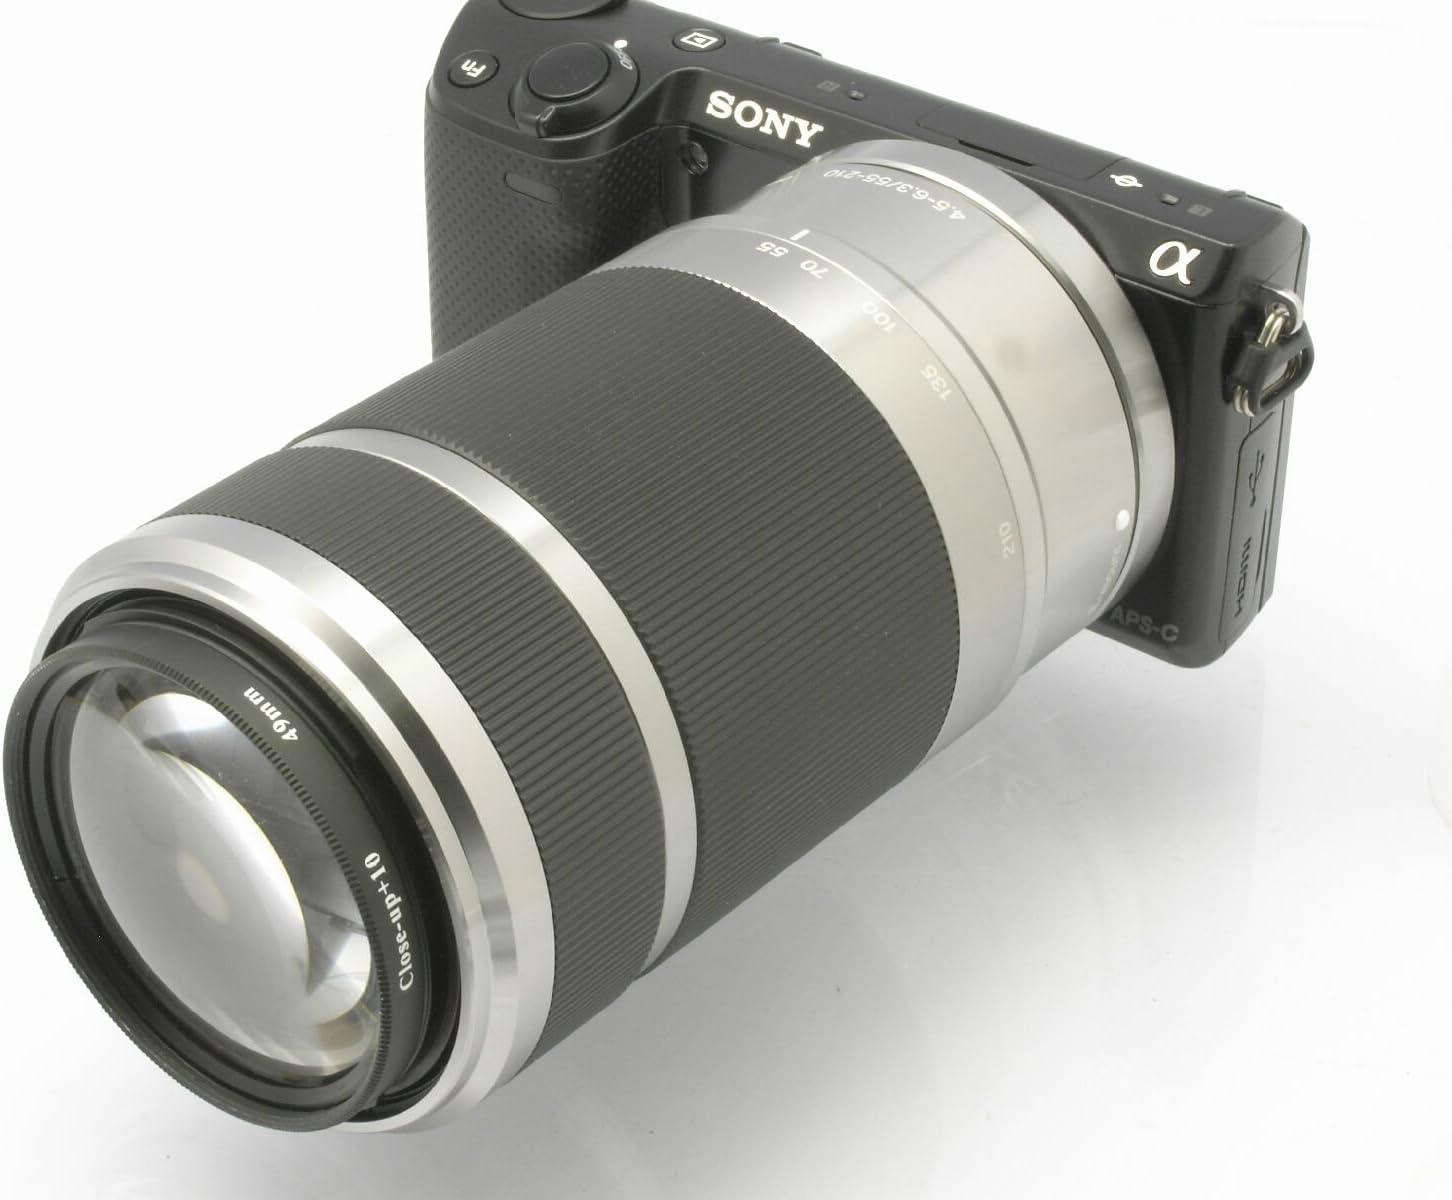 55-210mm or 16-50mm Lenses 10 Diopter Closeup Lens and Step Ring for Sony Alpha NEX-7 NEX-6 NEX-5R NEX-5N NEX-5 NEX-3 NEX-C3 NEX-F3 with The 18-55mm Photo Plus